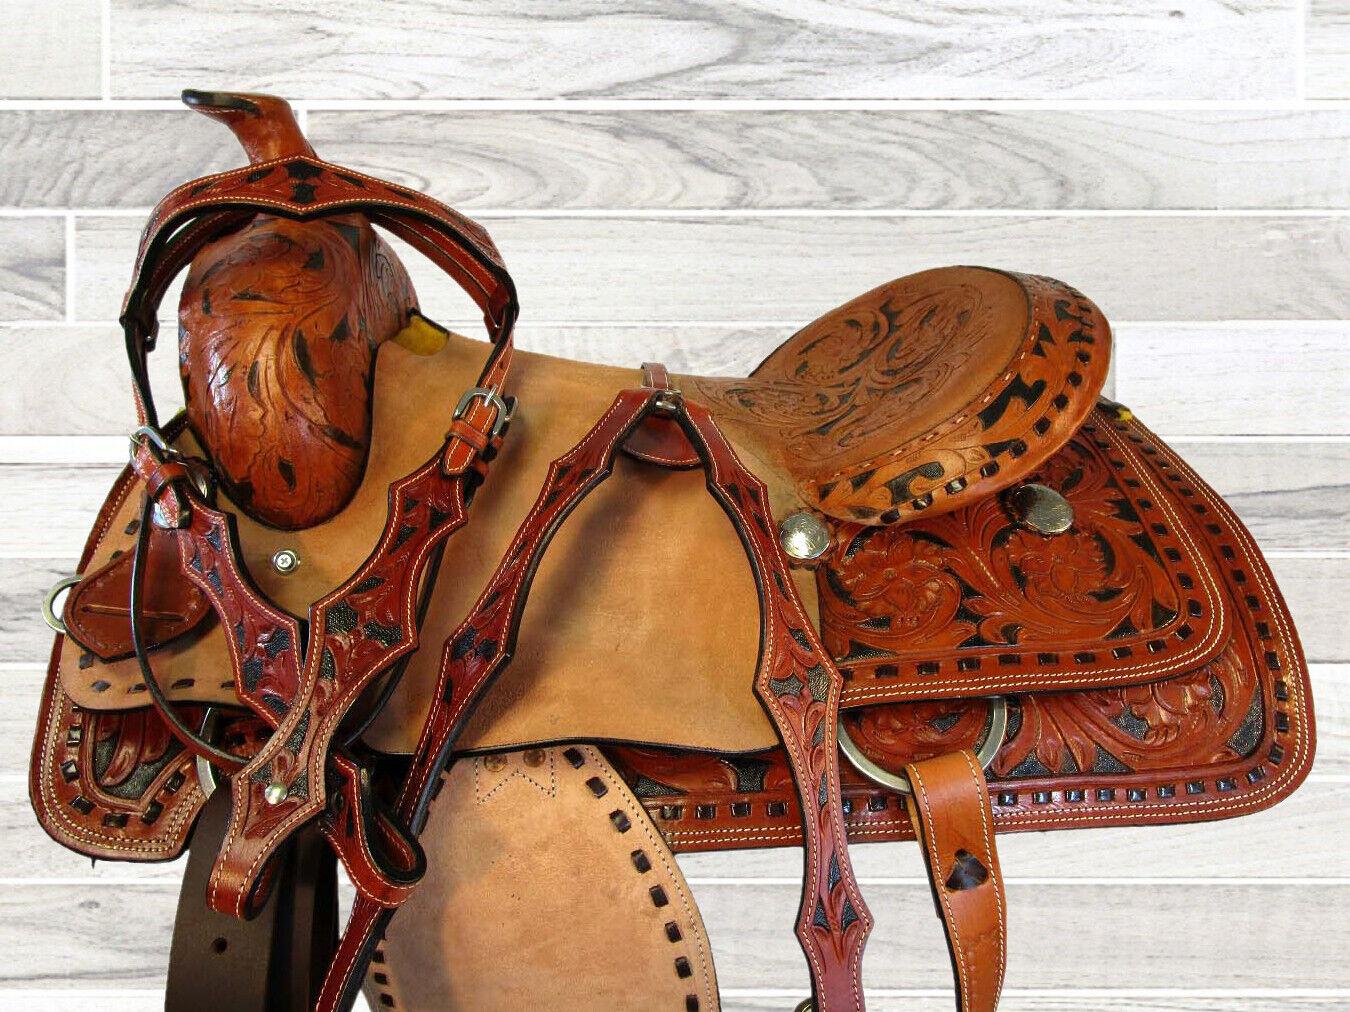 Pro 16 17 occidentales labrada de Cuero Pintado caballo oeste Roper Rancho amarrar silla de montar